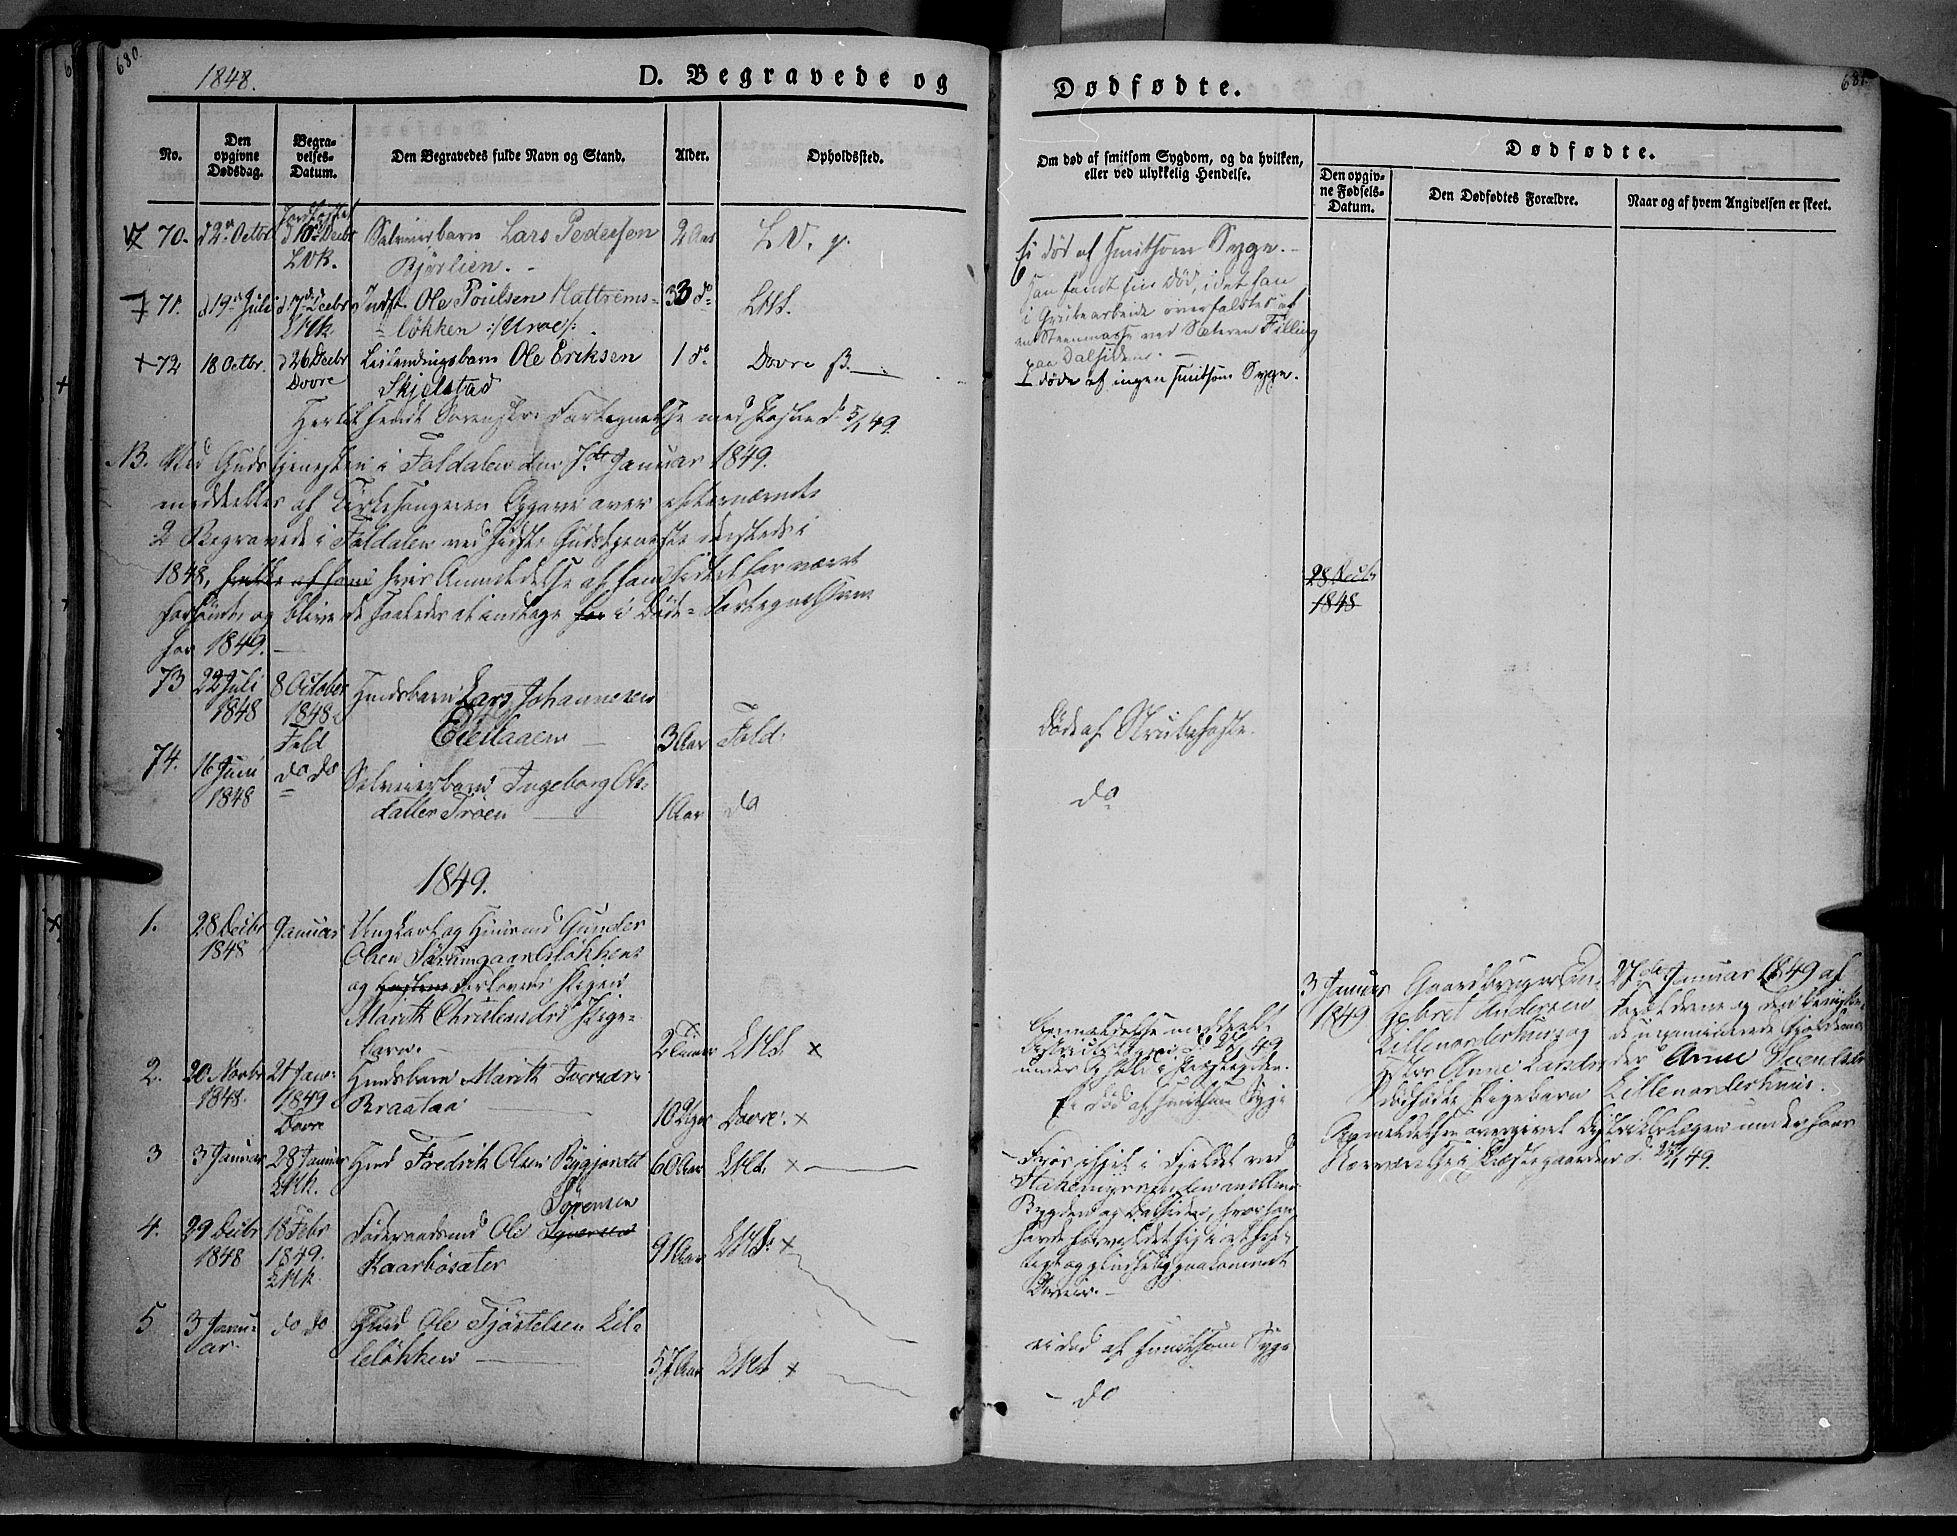 SAH, Lesja prestekontor, Ministerialbok nr. 6B, 1843-1854, s. 680-681